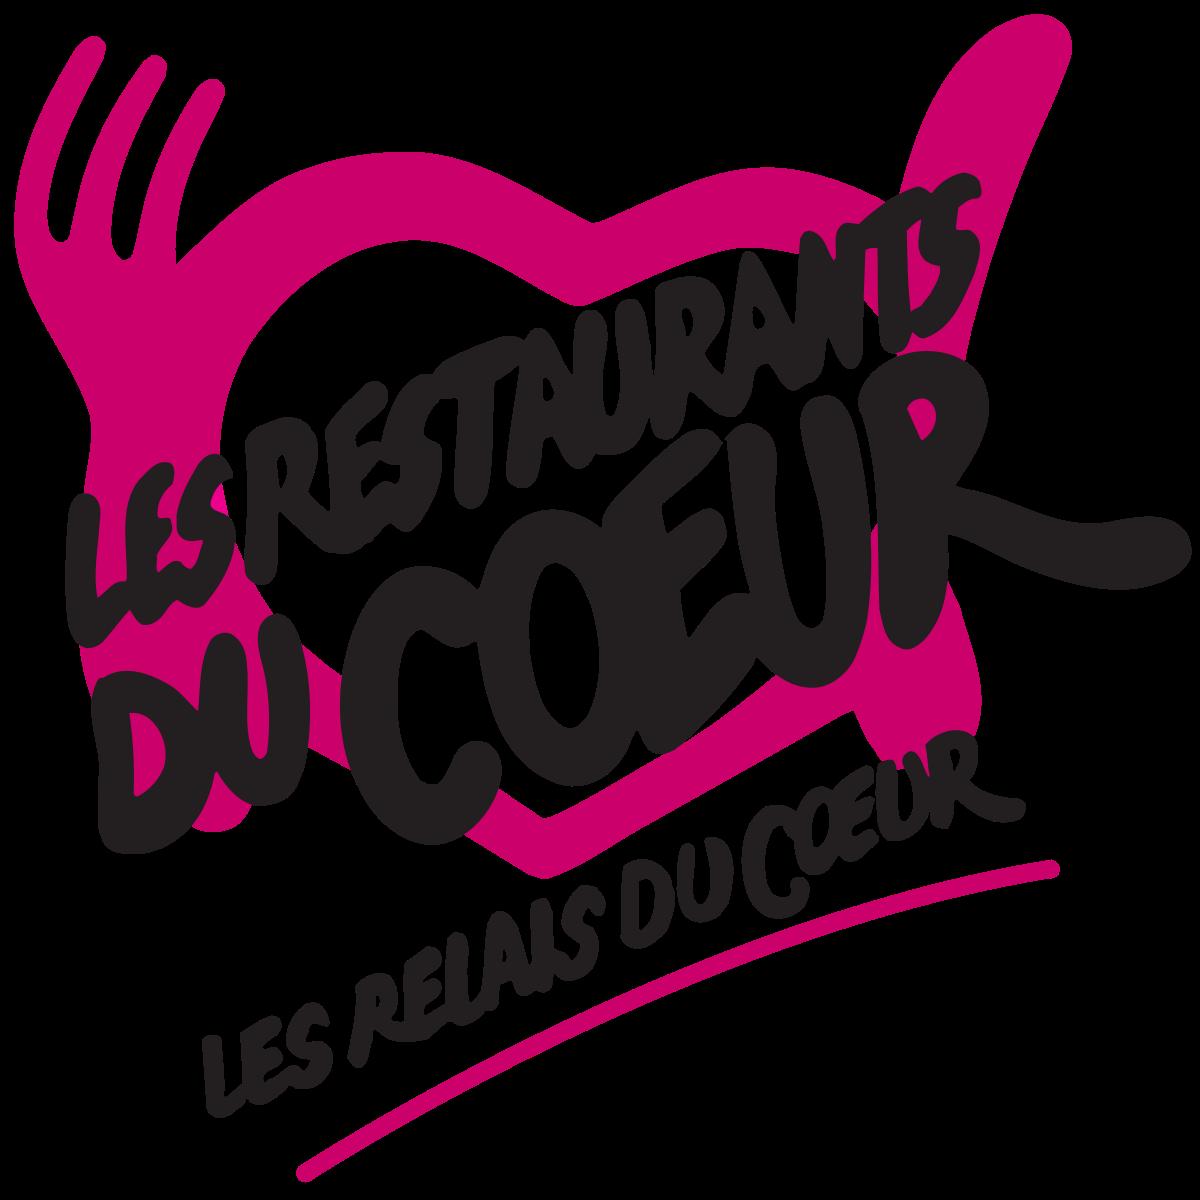 Logo des Restos du cœur